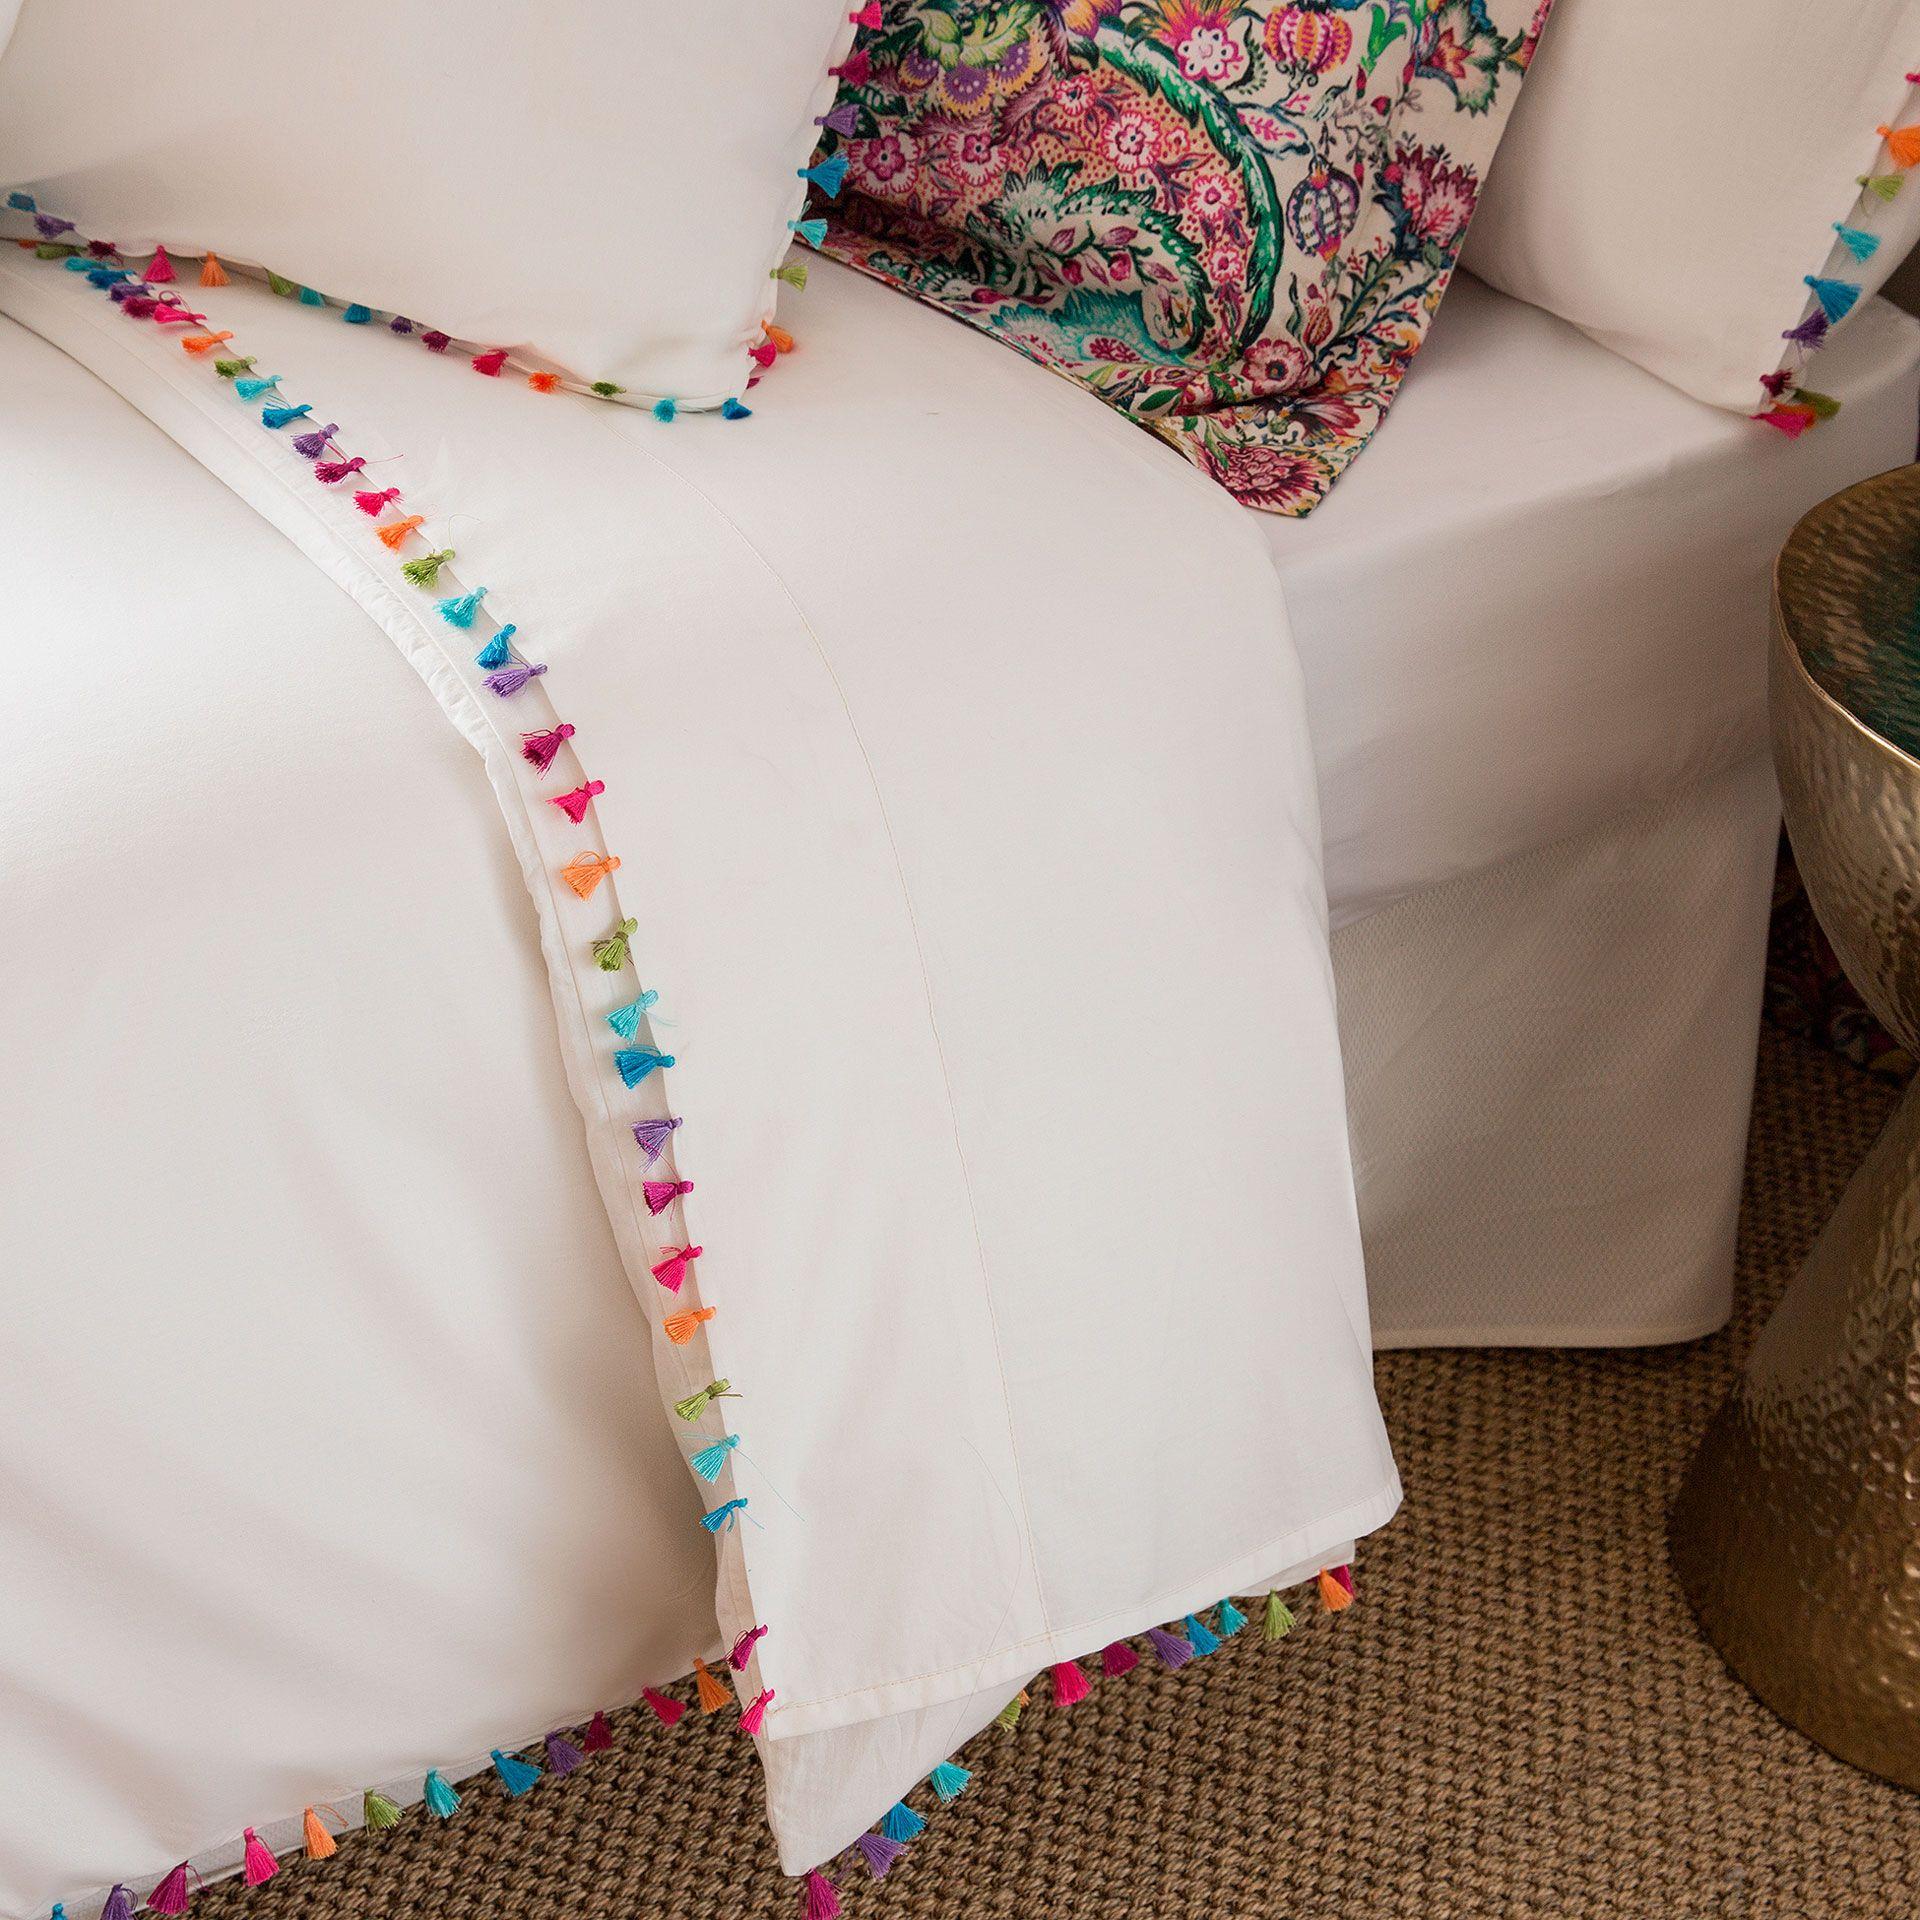 Pompom Percale Bed Linen Bed Linen Bedroom Zara Home Turkiye Turkey Zara Home Nevresim Takimi Nevresim